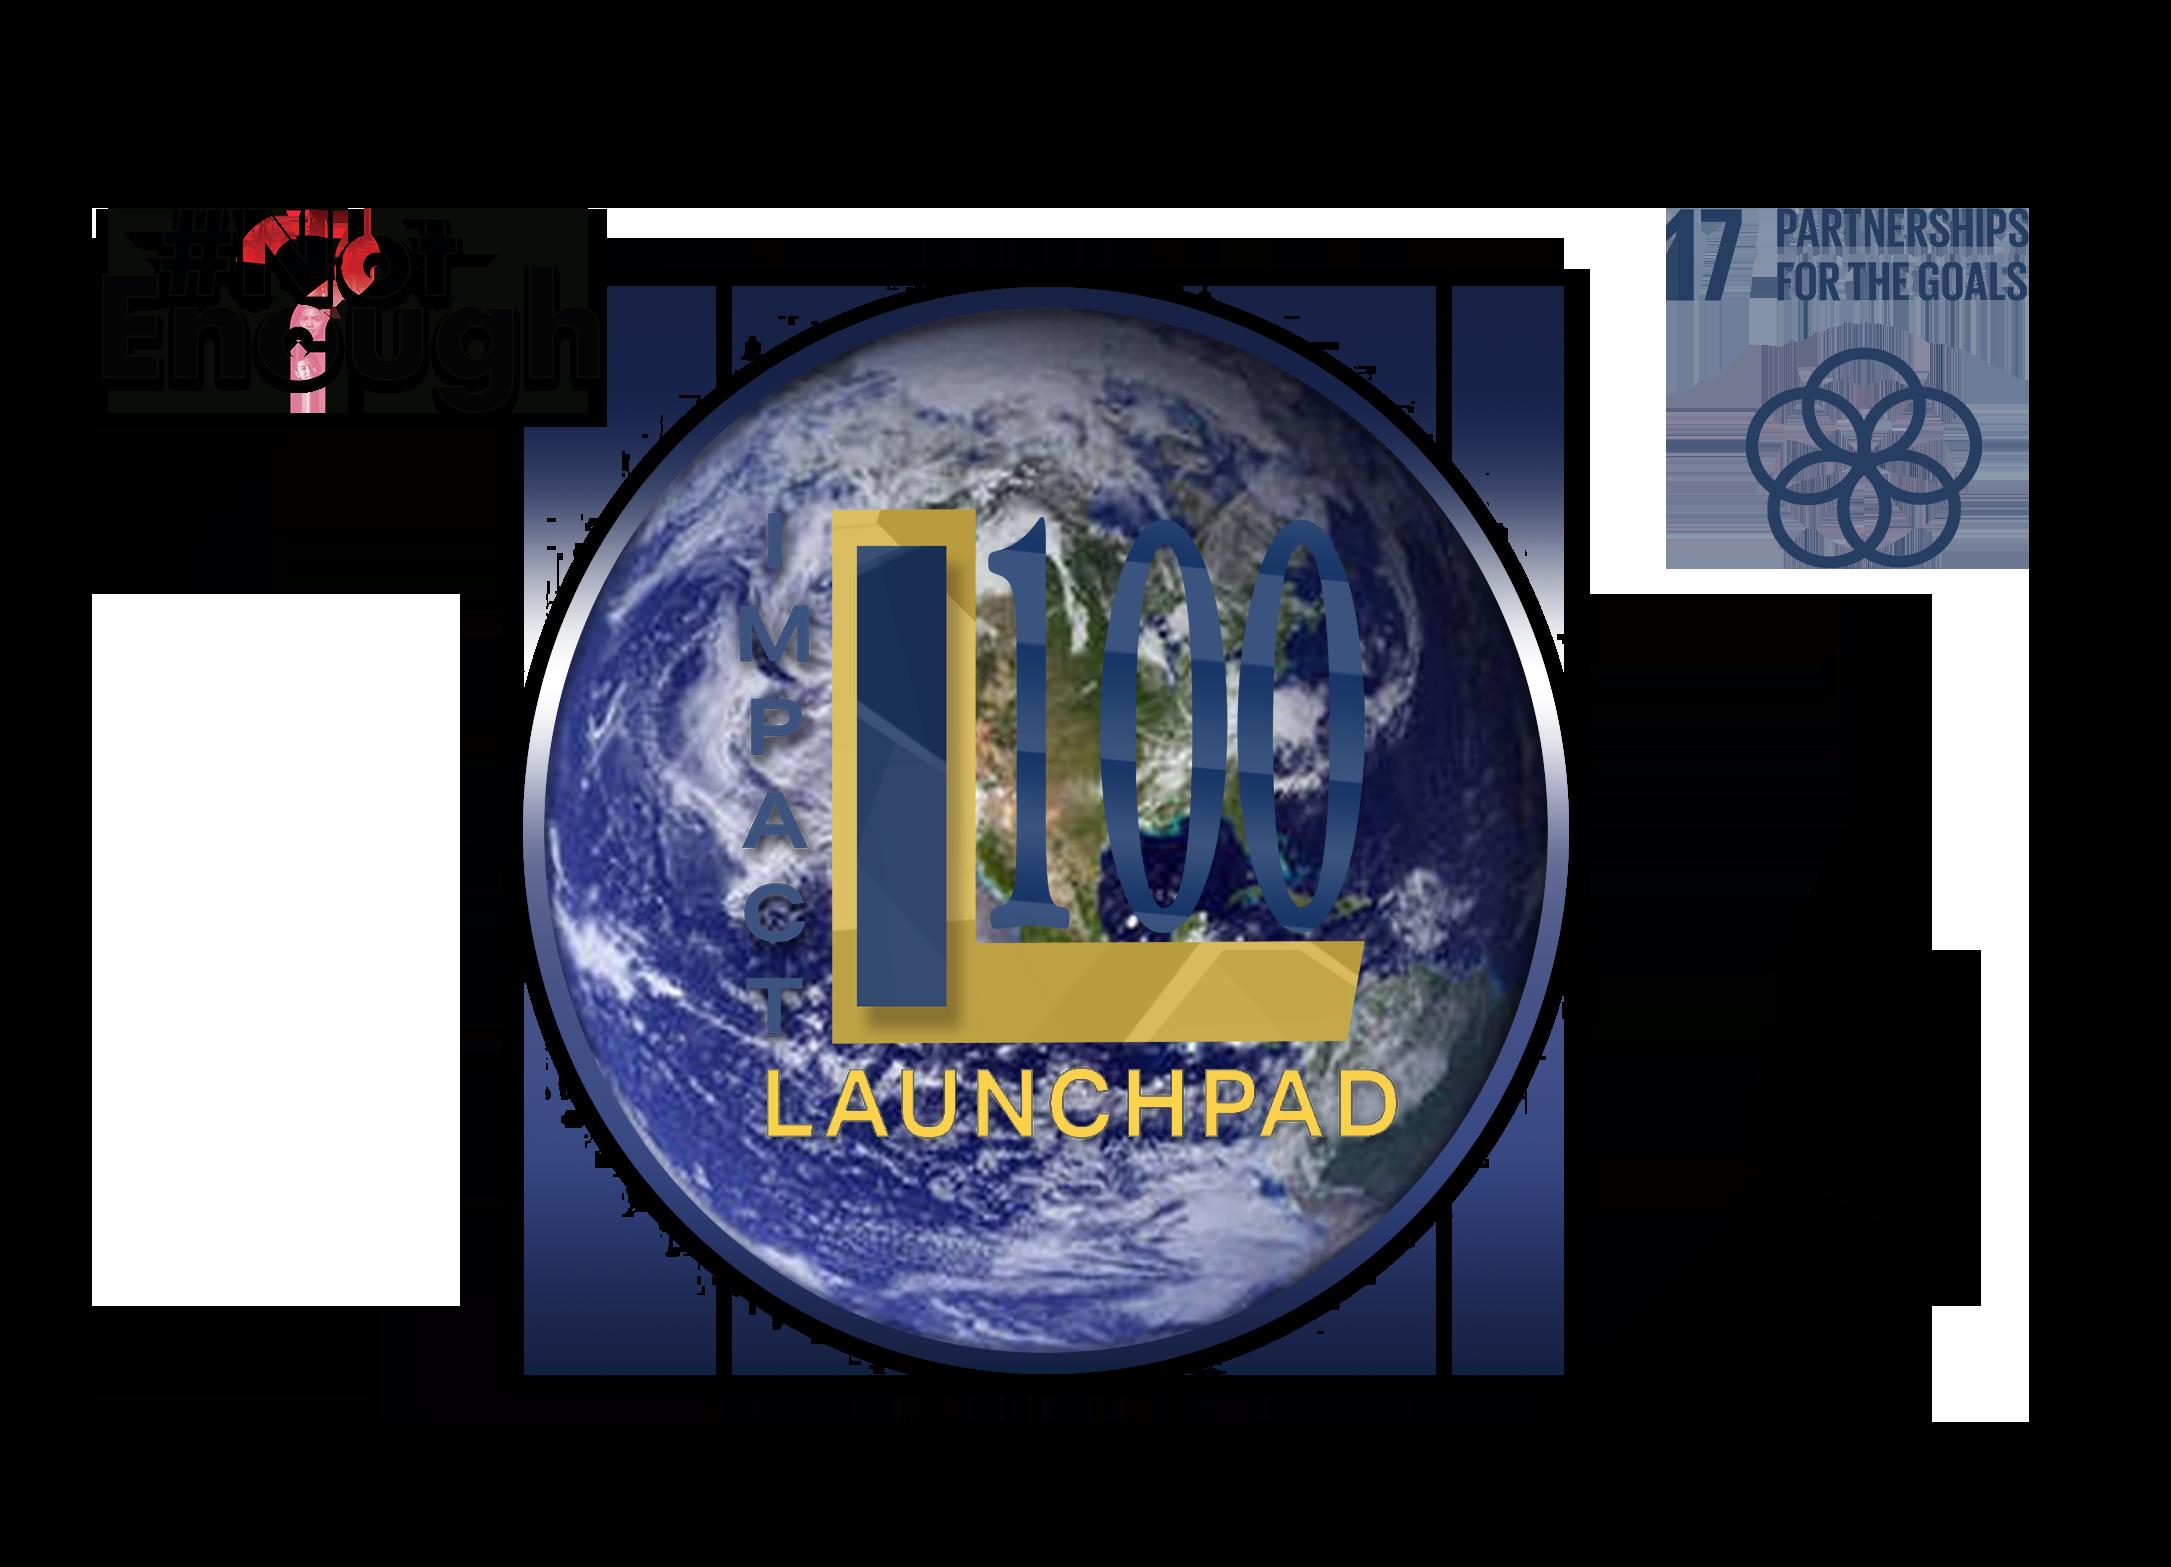 #NotEnough IL and SDG 17